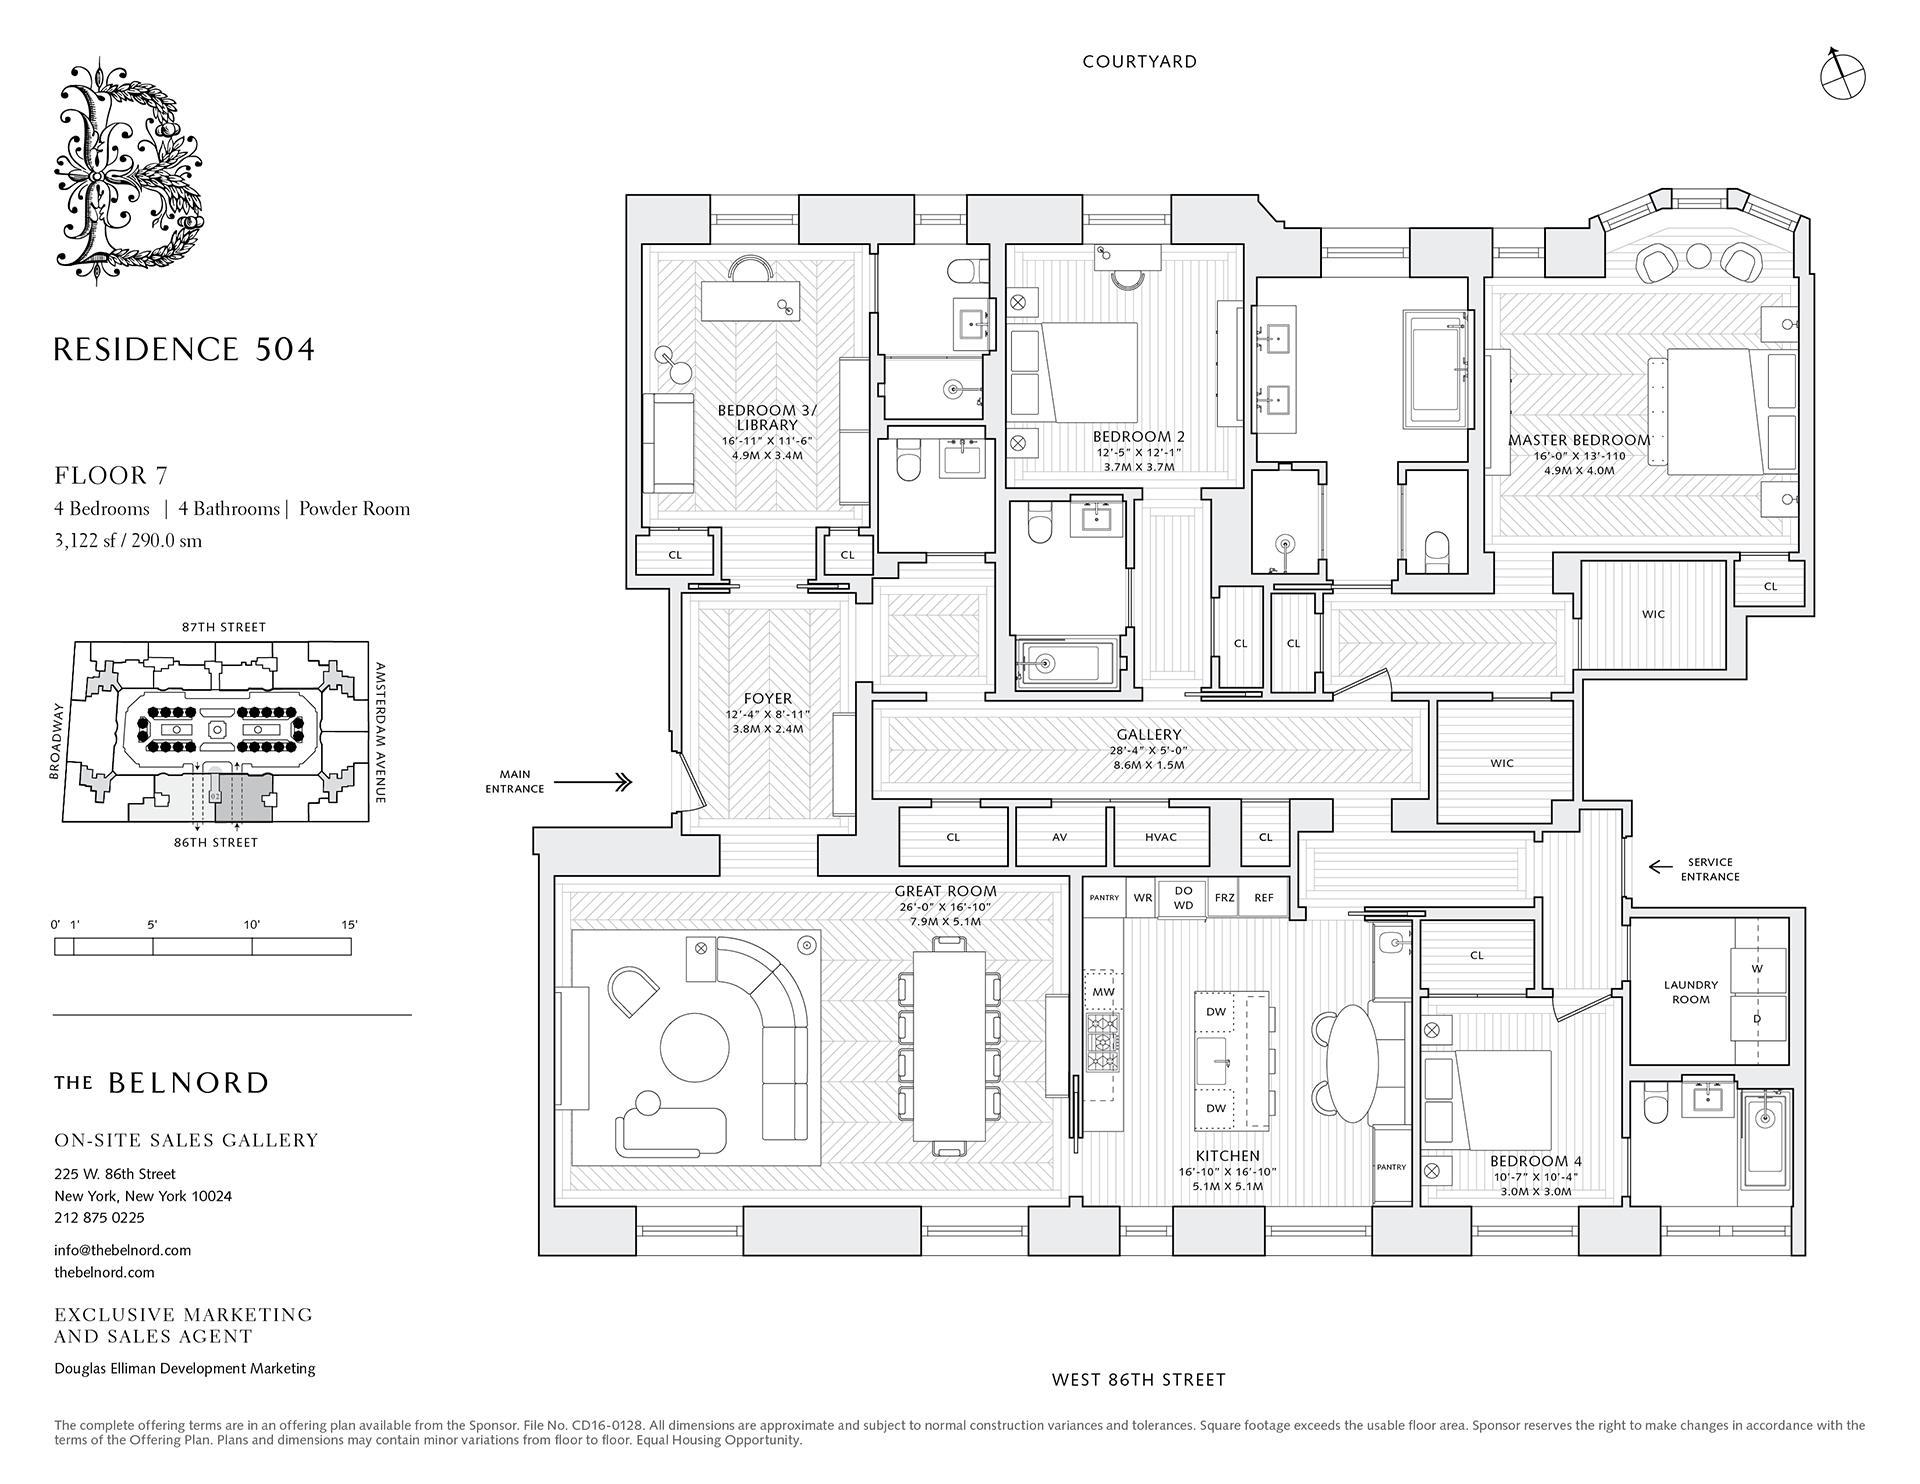 Floor plan of The Belnord, 225 West 86th Street, 504 - Upper West Side, New York